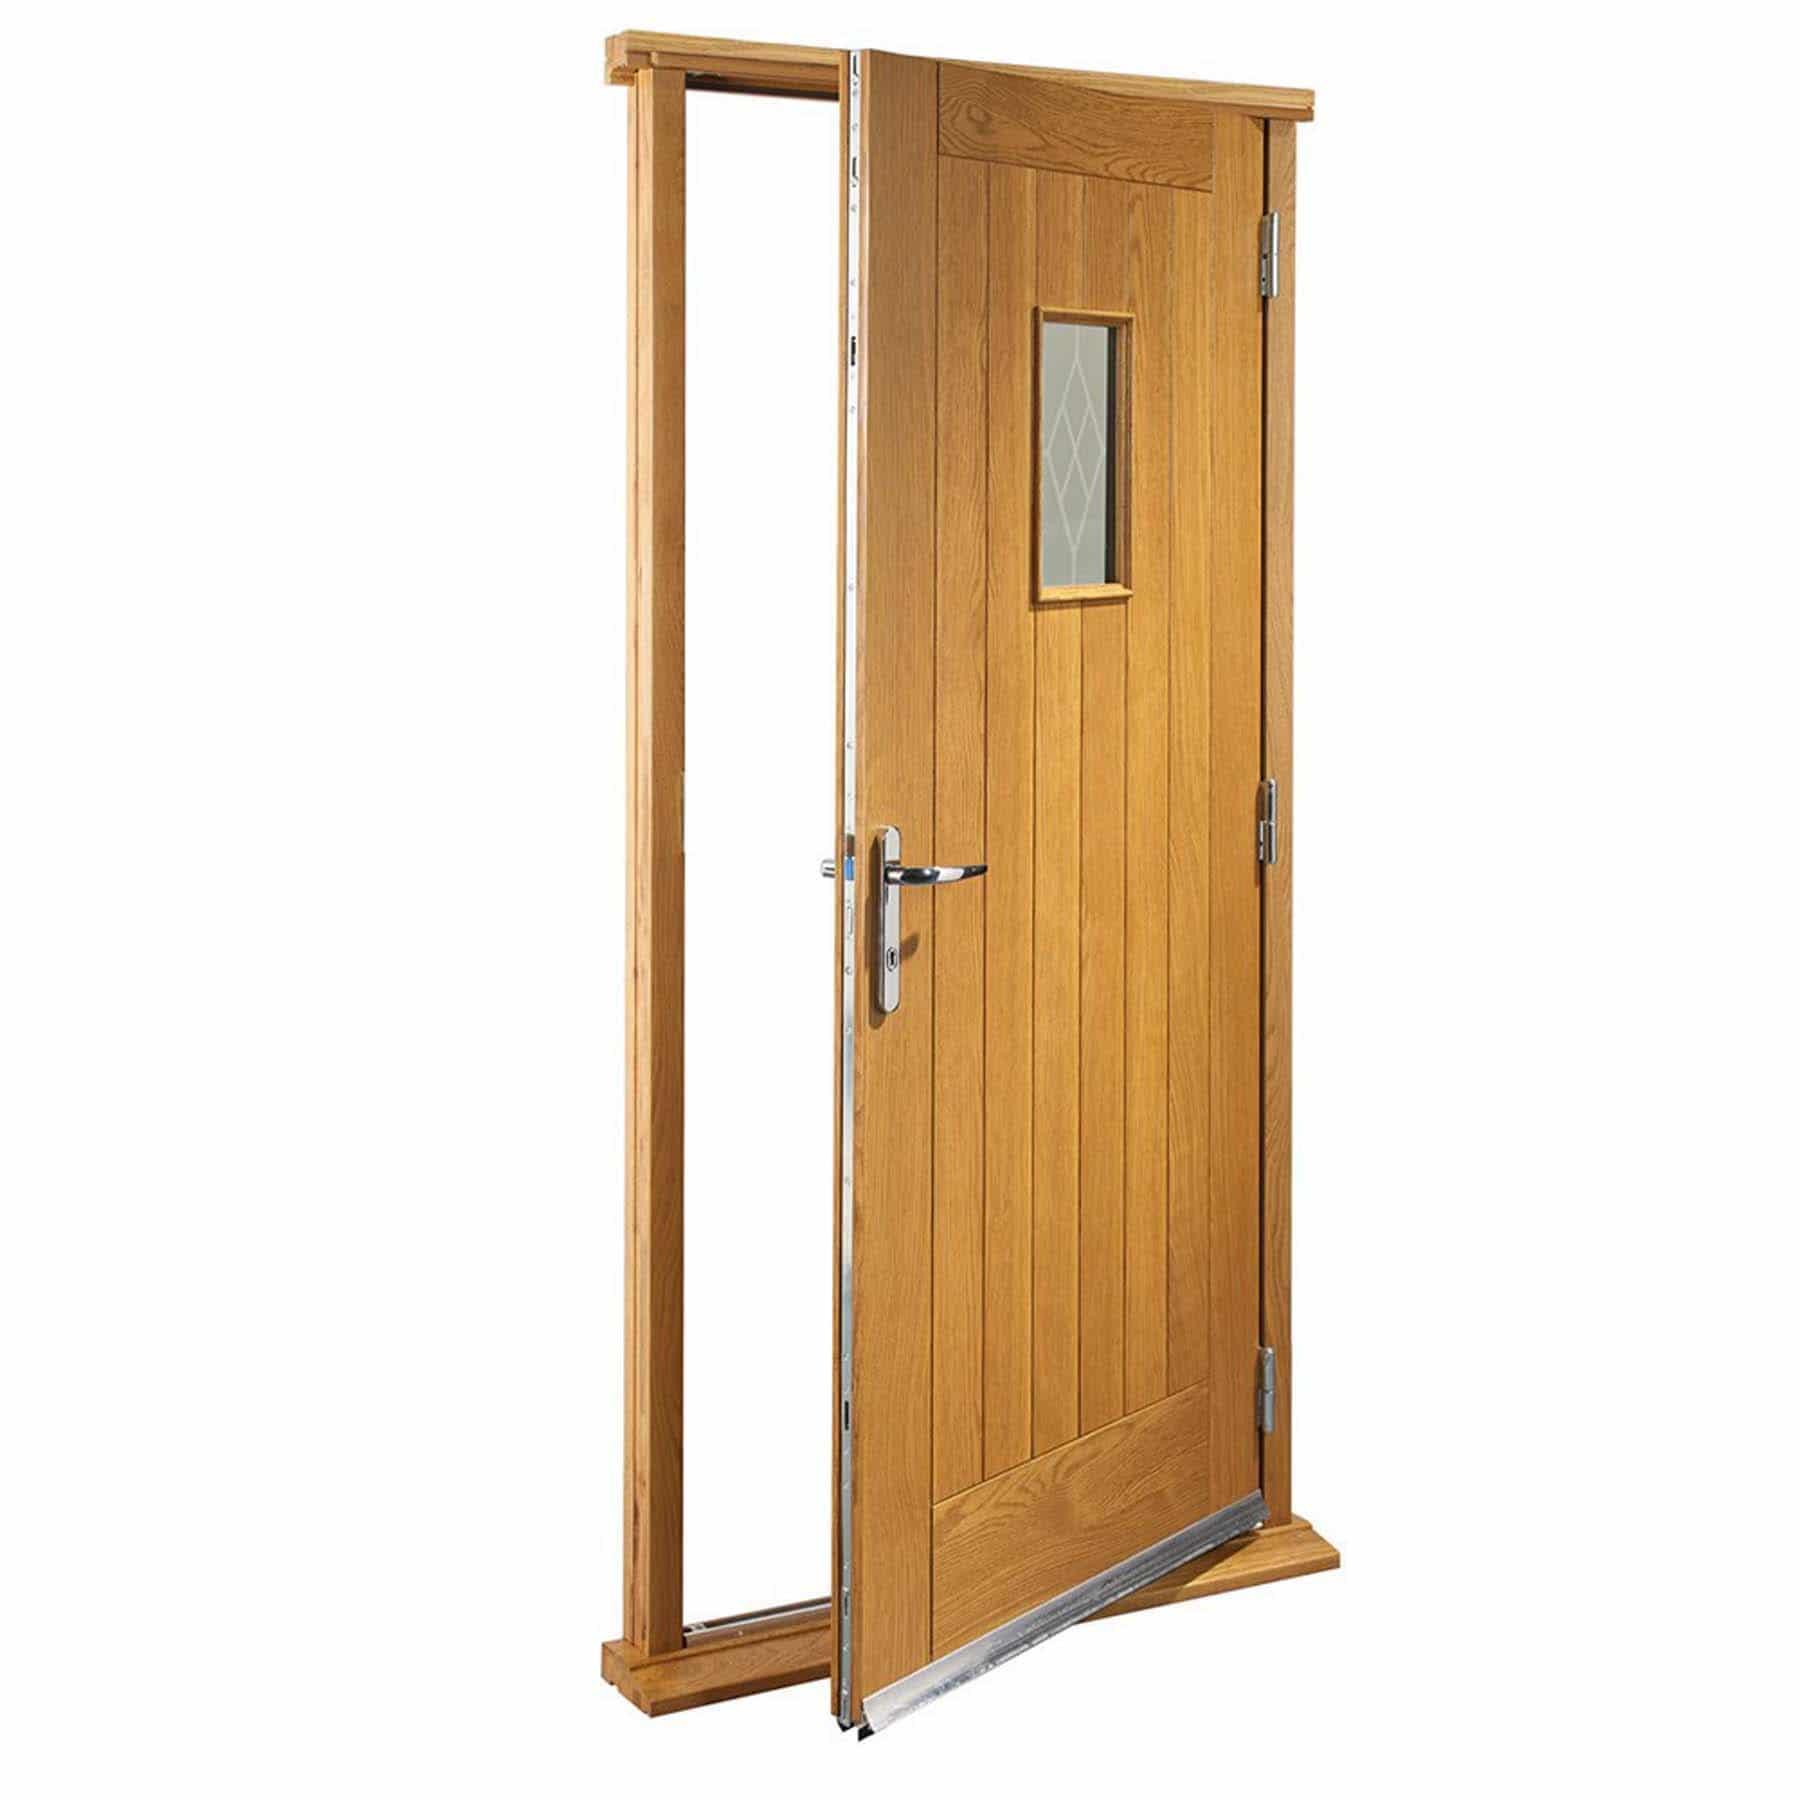 pre finished chancery oak external door with decorative. Black Bedroom Furniture Sets. Home Design Ideas